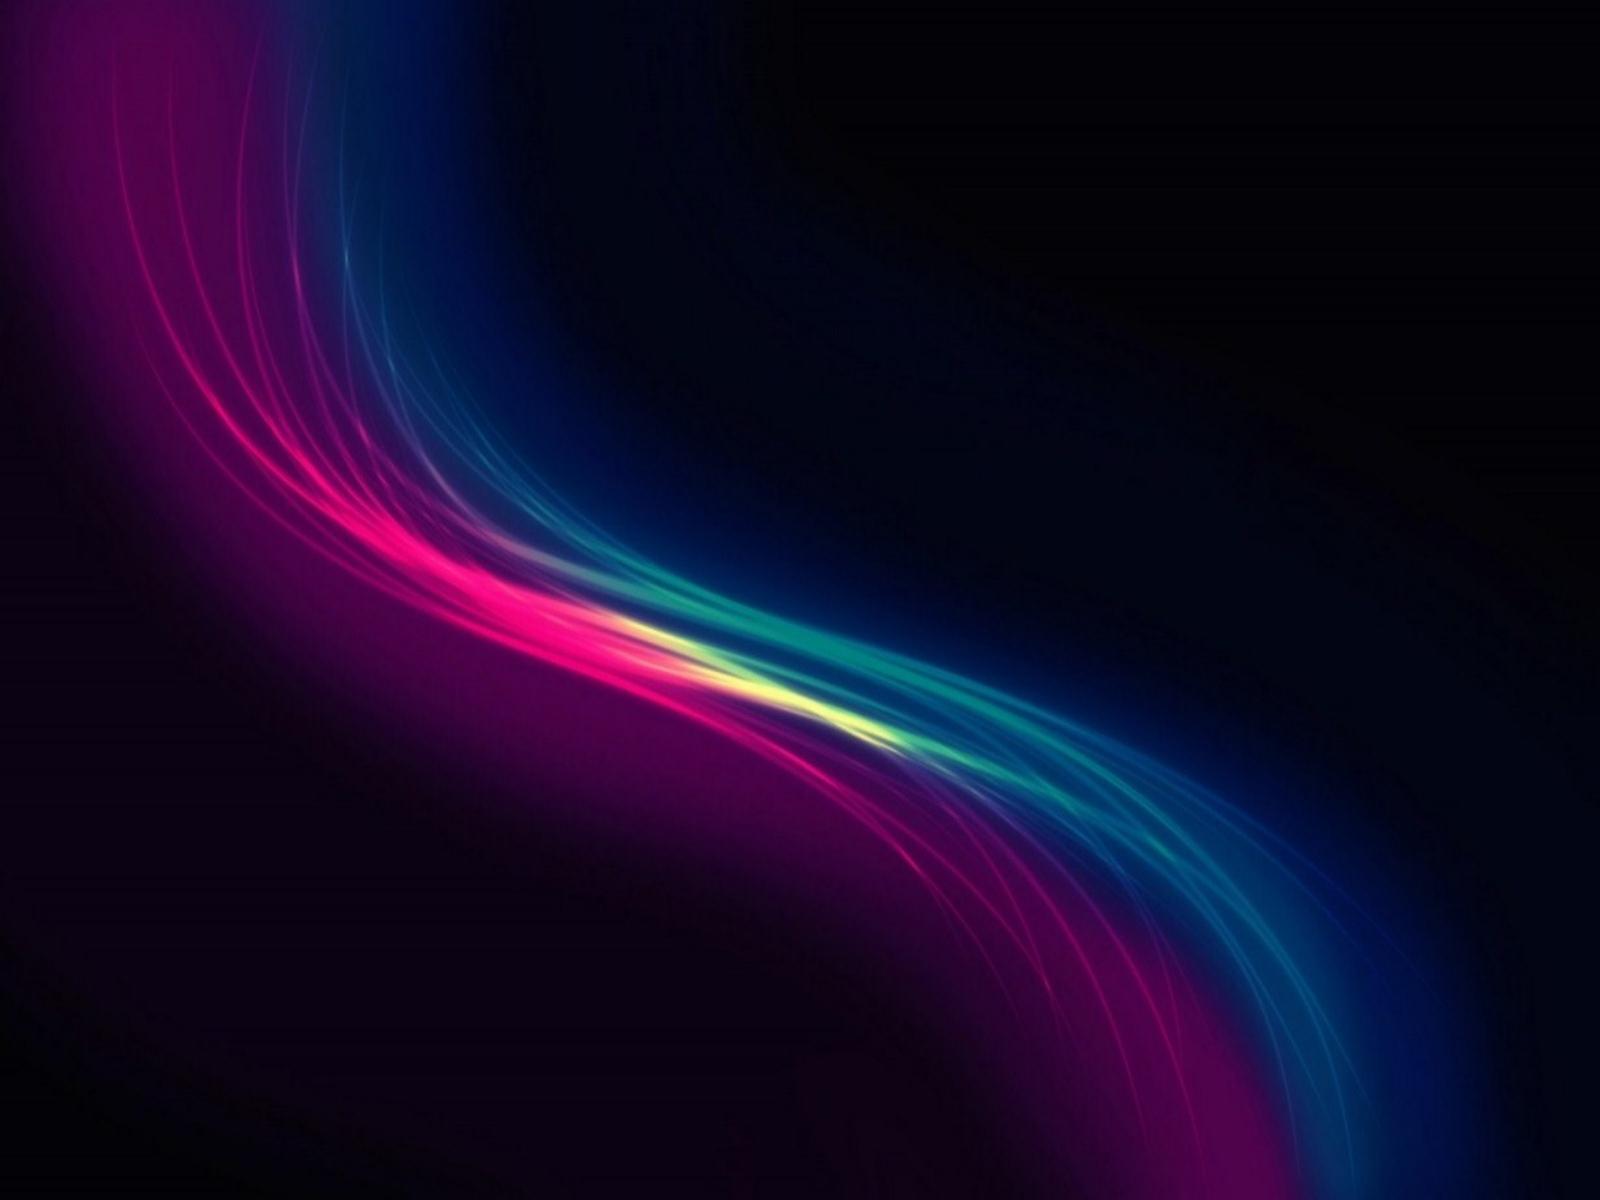 Cool Ubuntu Desktop Wallpapers Ubuntu Precise Pangolin HD   1600x1200 1600x1200